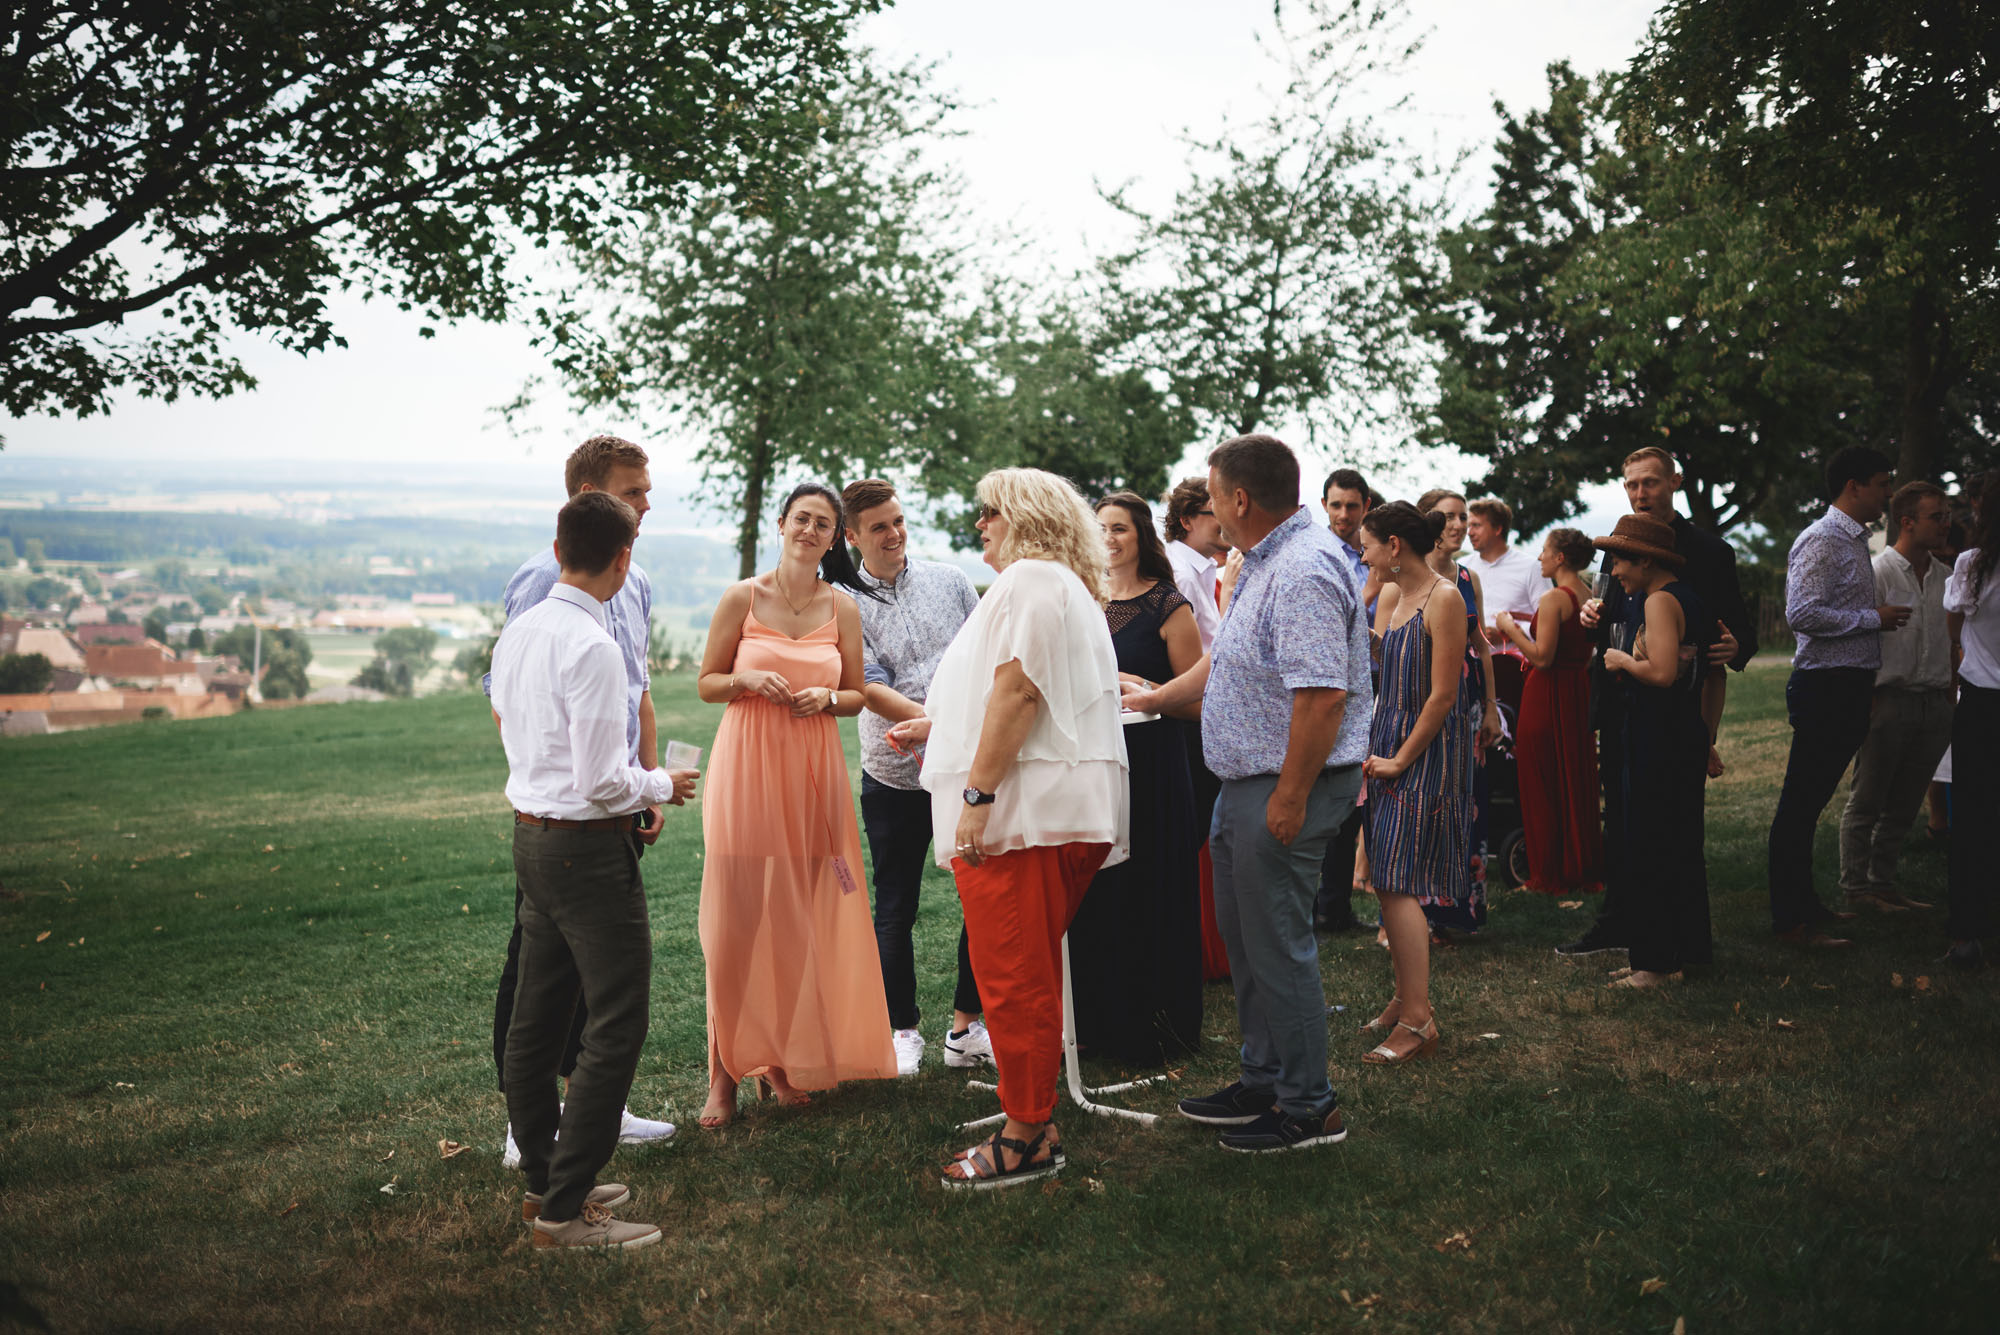 Martin Spoerl Potography Hochzeit Ailinger Muehle 0034